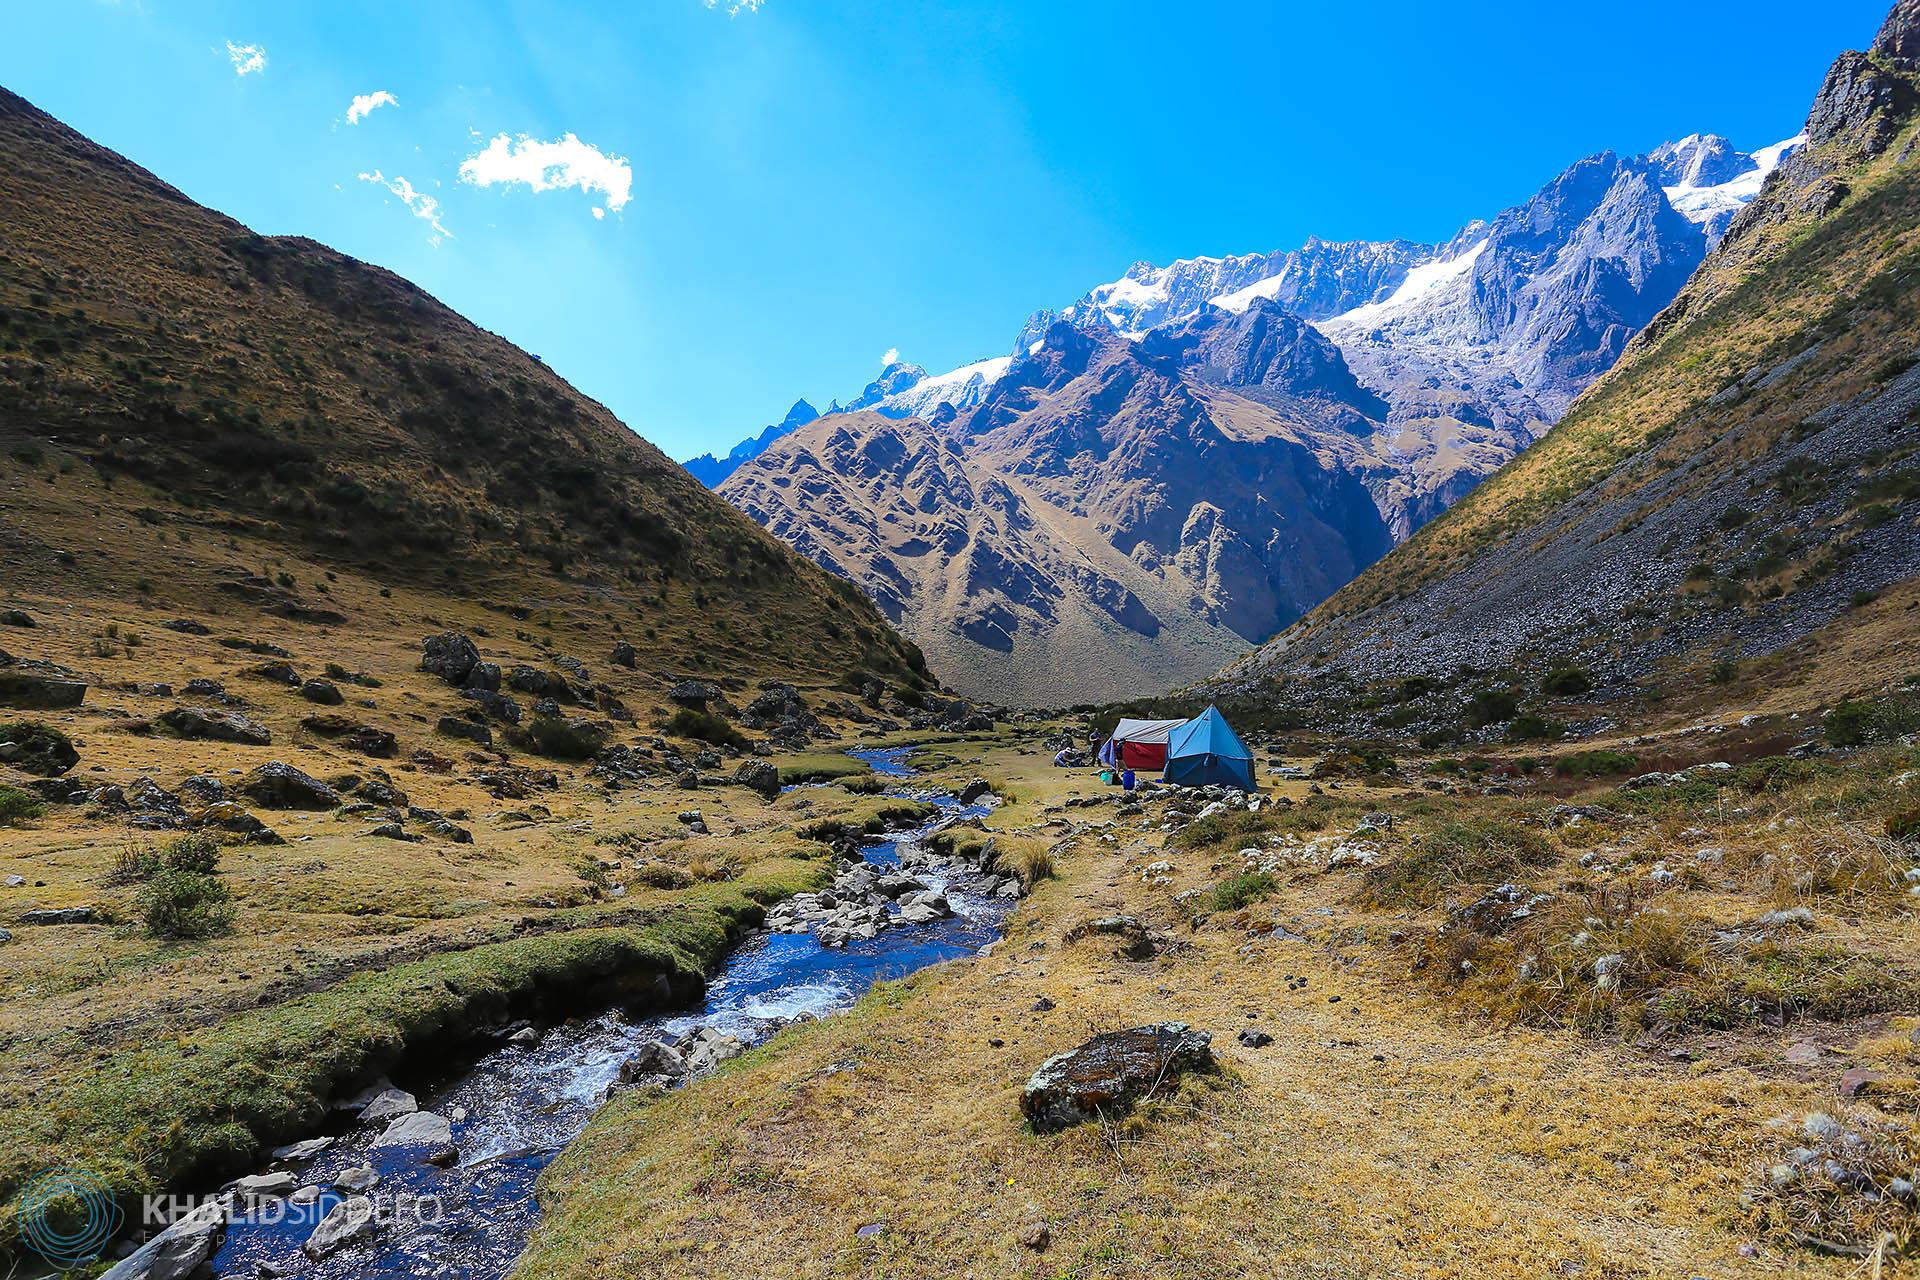 Andes Mountain, Peru - جبال الإنديز، البيرو